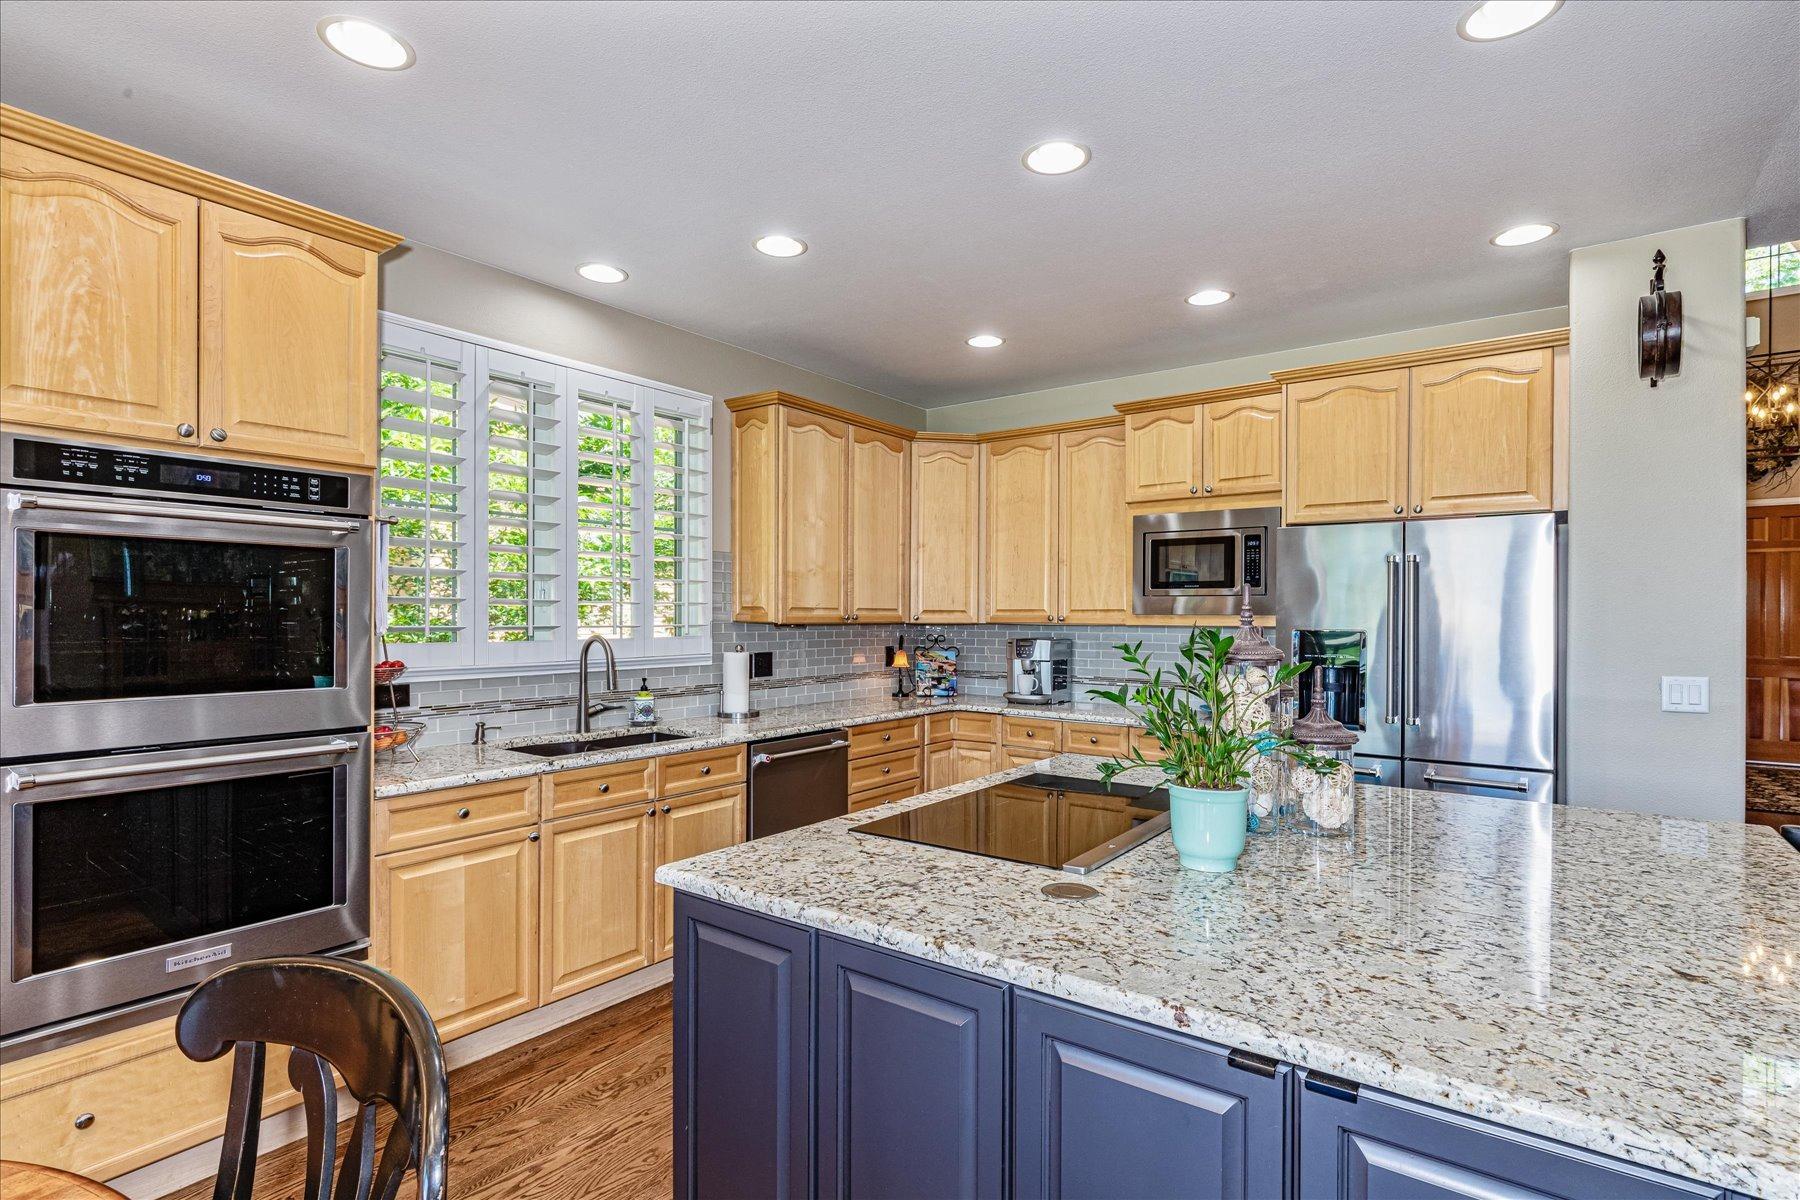 Newer Stainless Appliances in Gourmet Kitchen